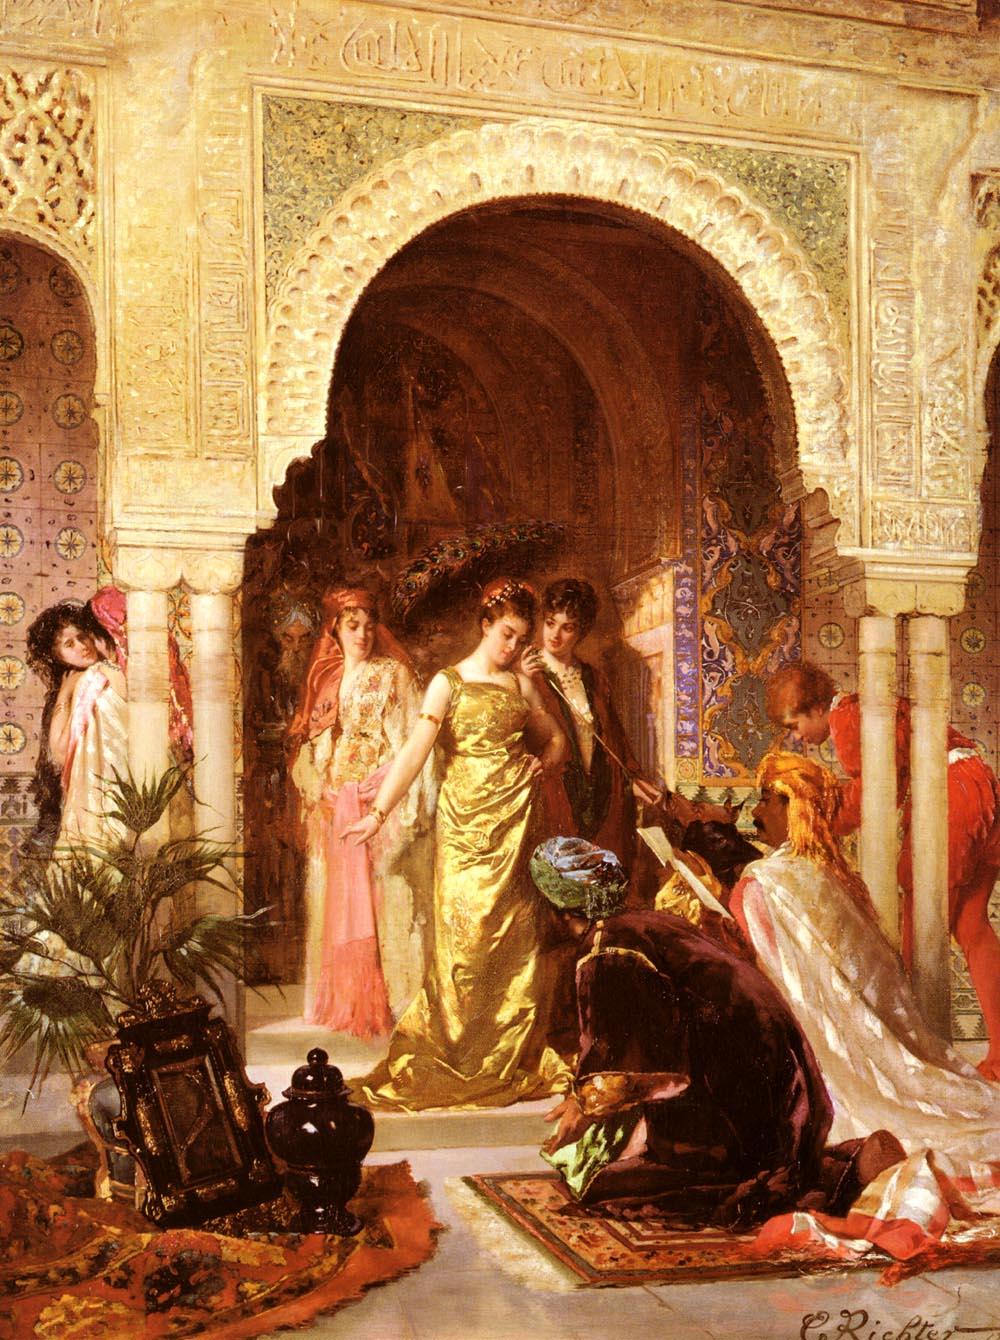 Loffrande | Edouard Frederic Wilhelm Richter | Oil Painting